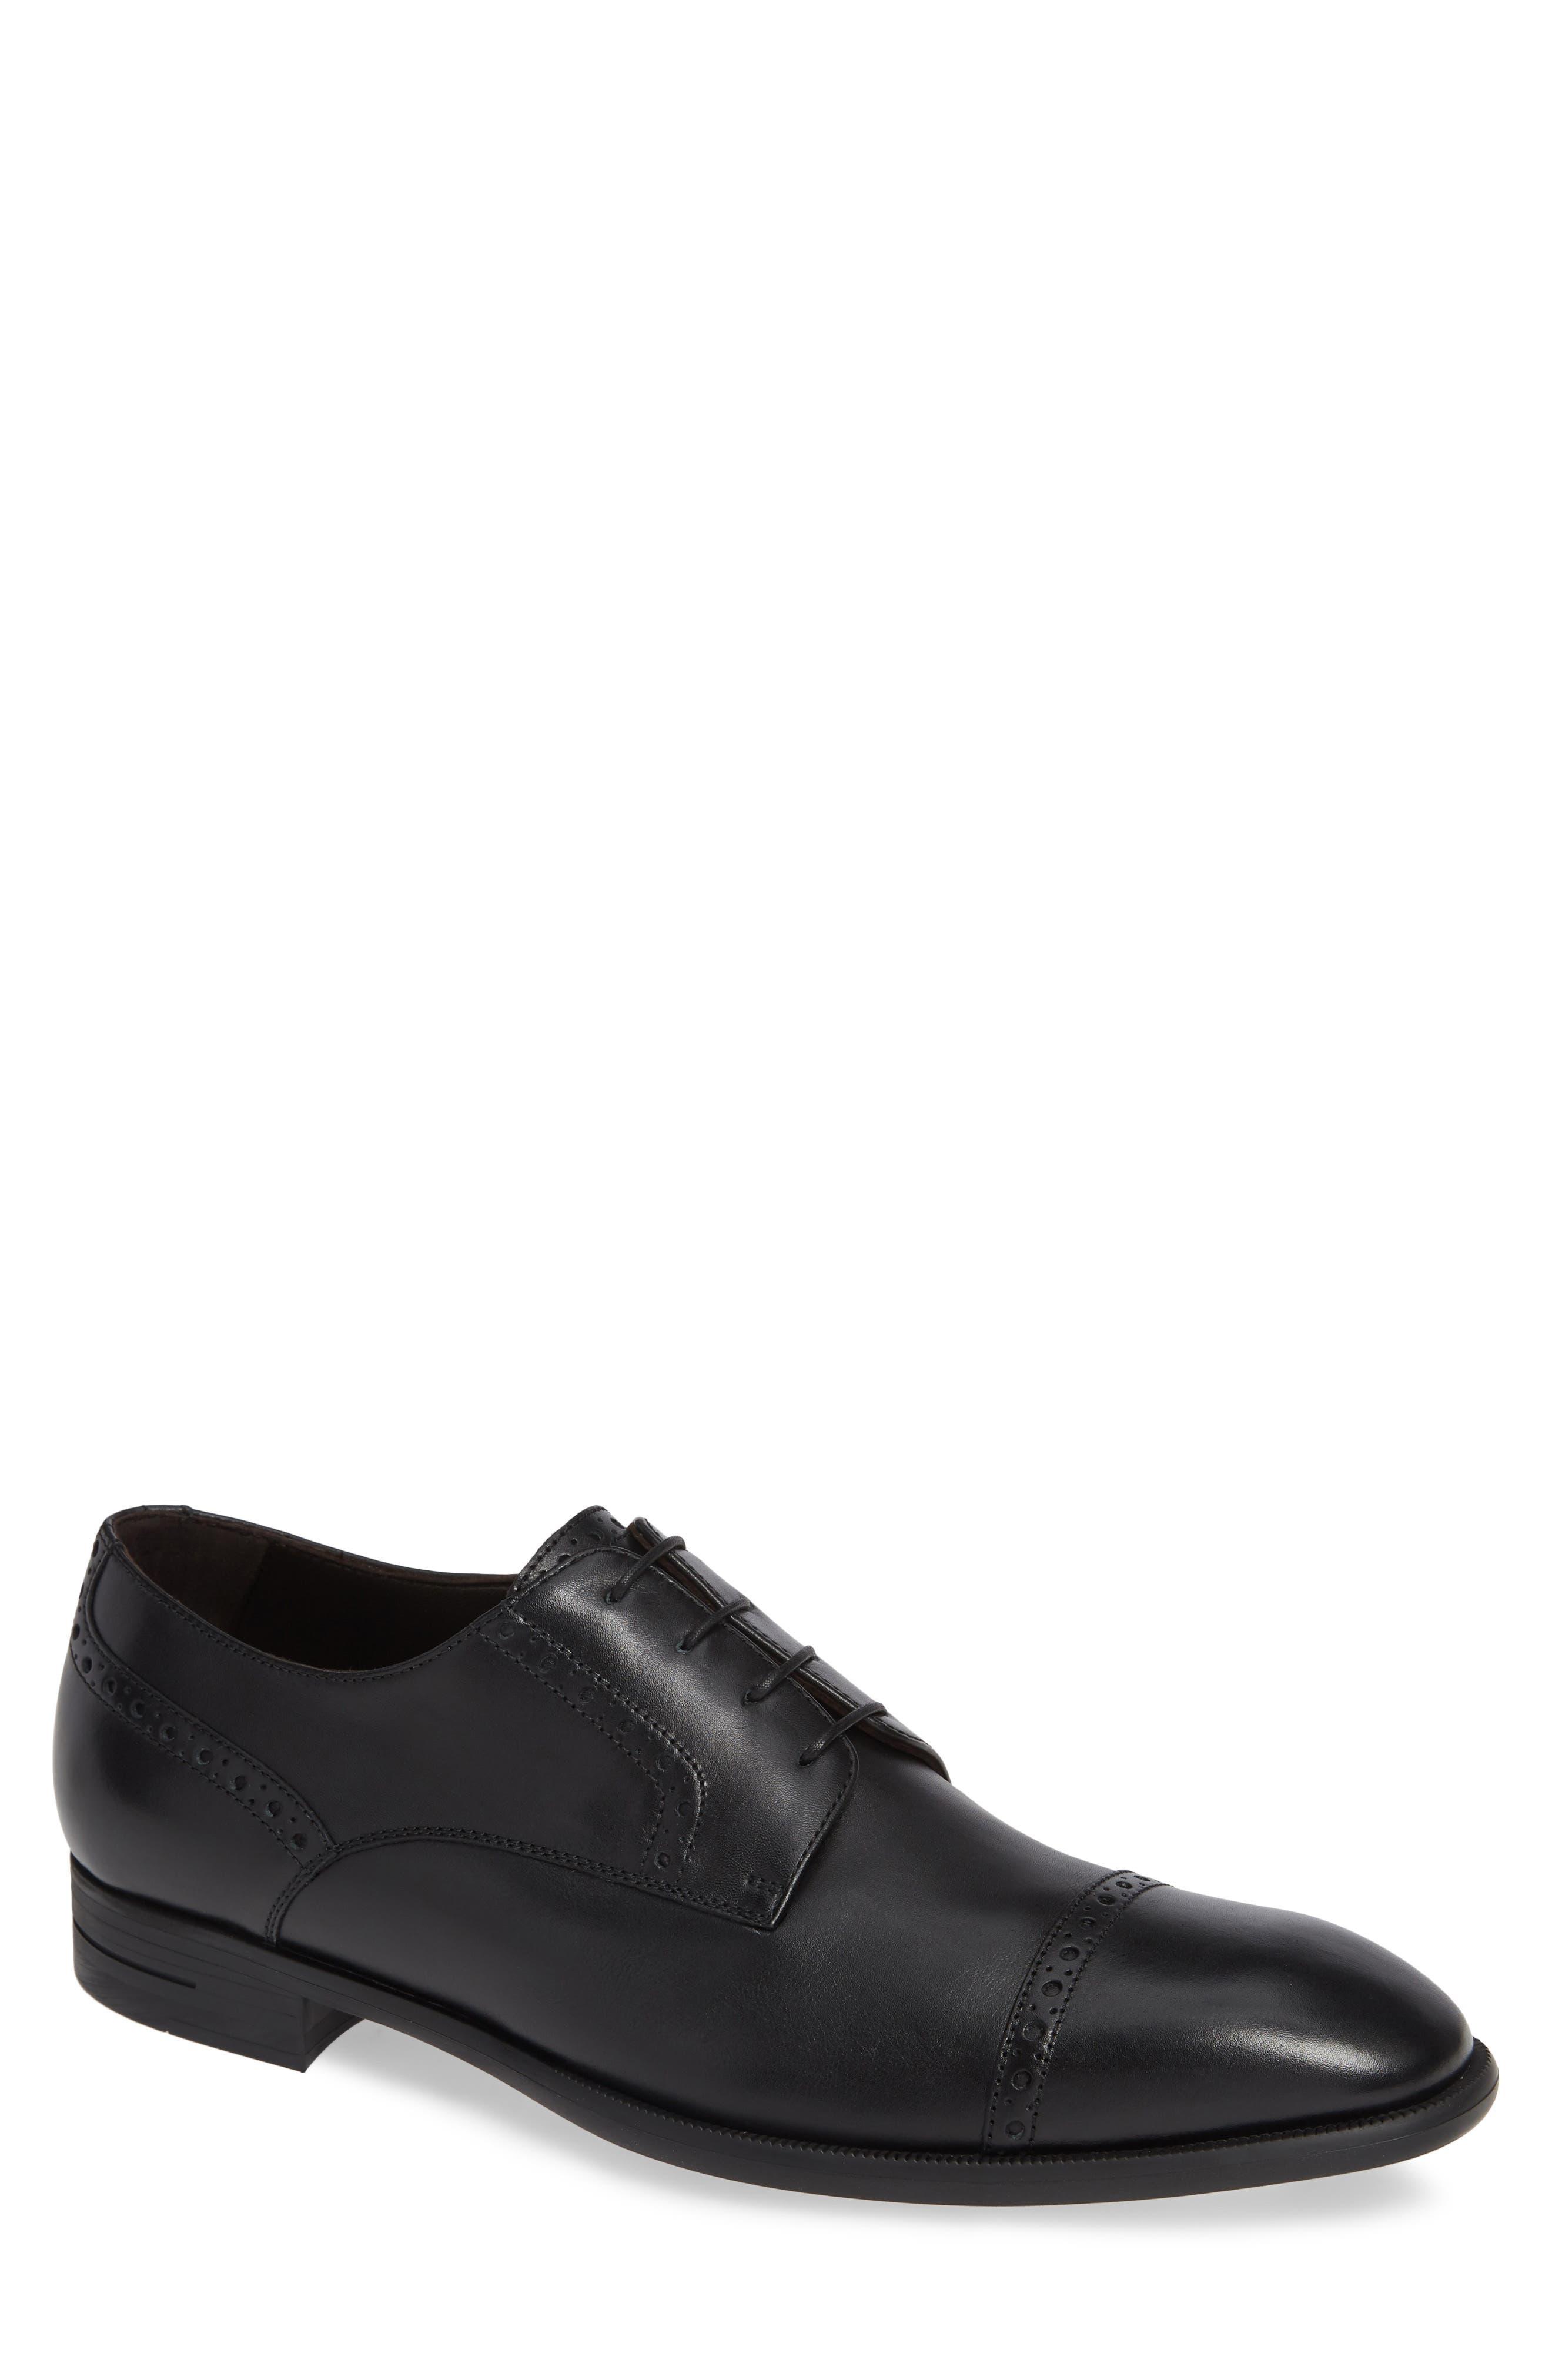 Men'S New Flex Cap-Toe Derby Shoes in Black